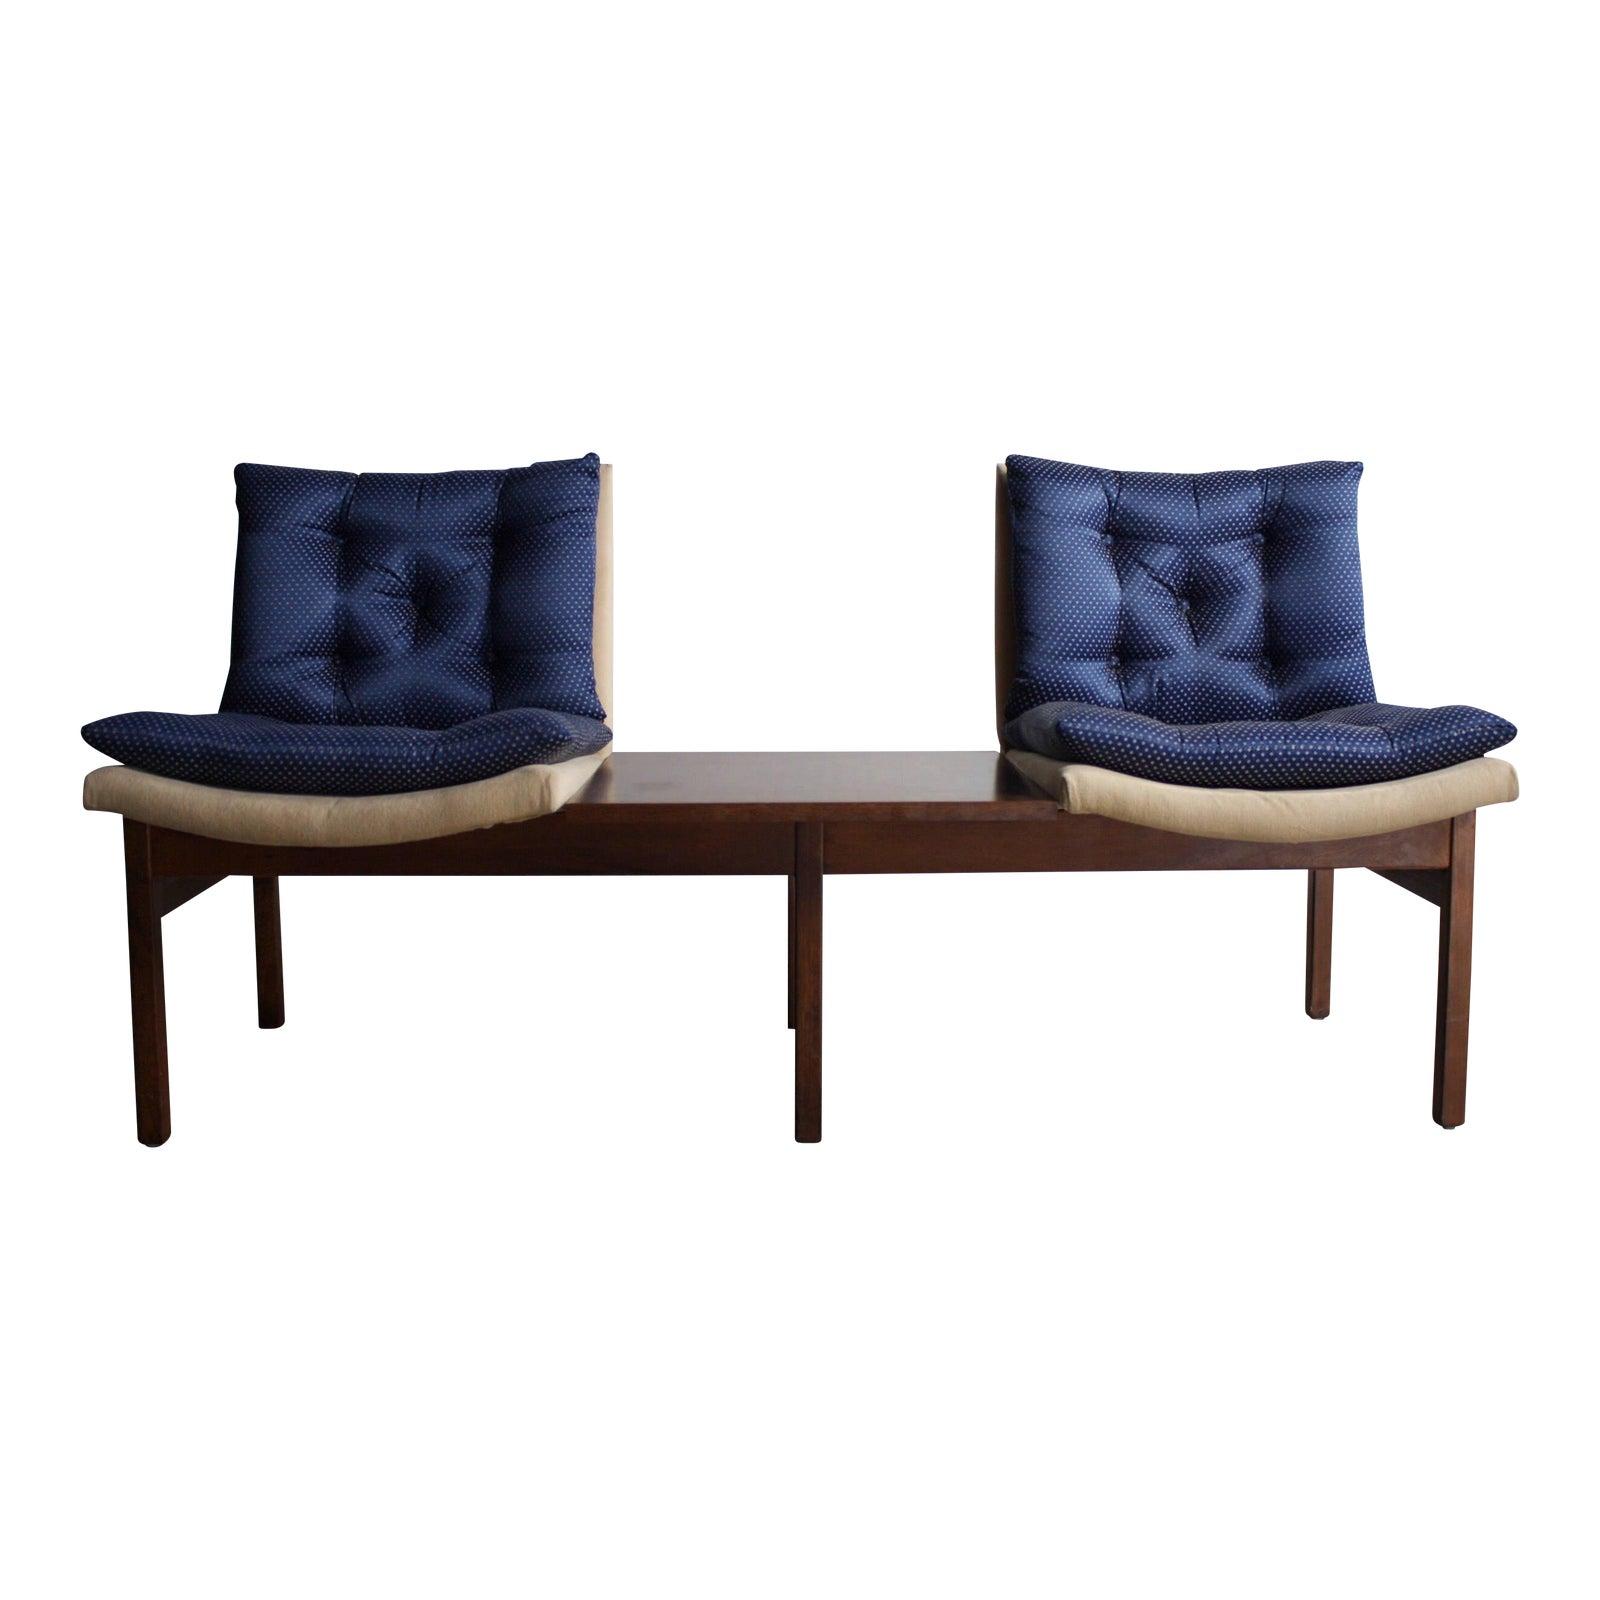 Arthur umanoff modular walnut bench seating for madison furniture co chairish